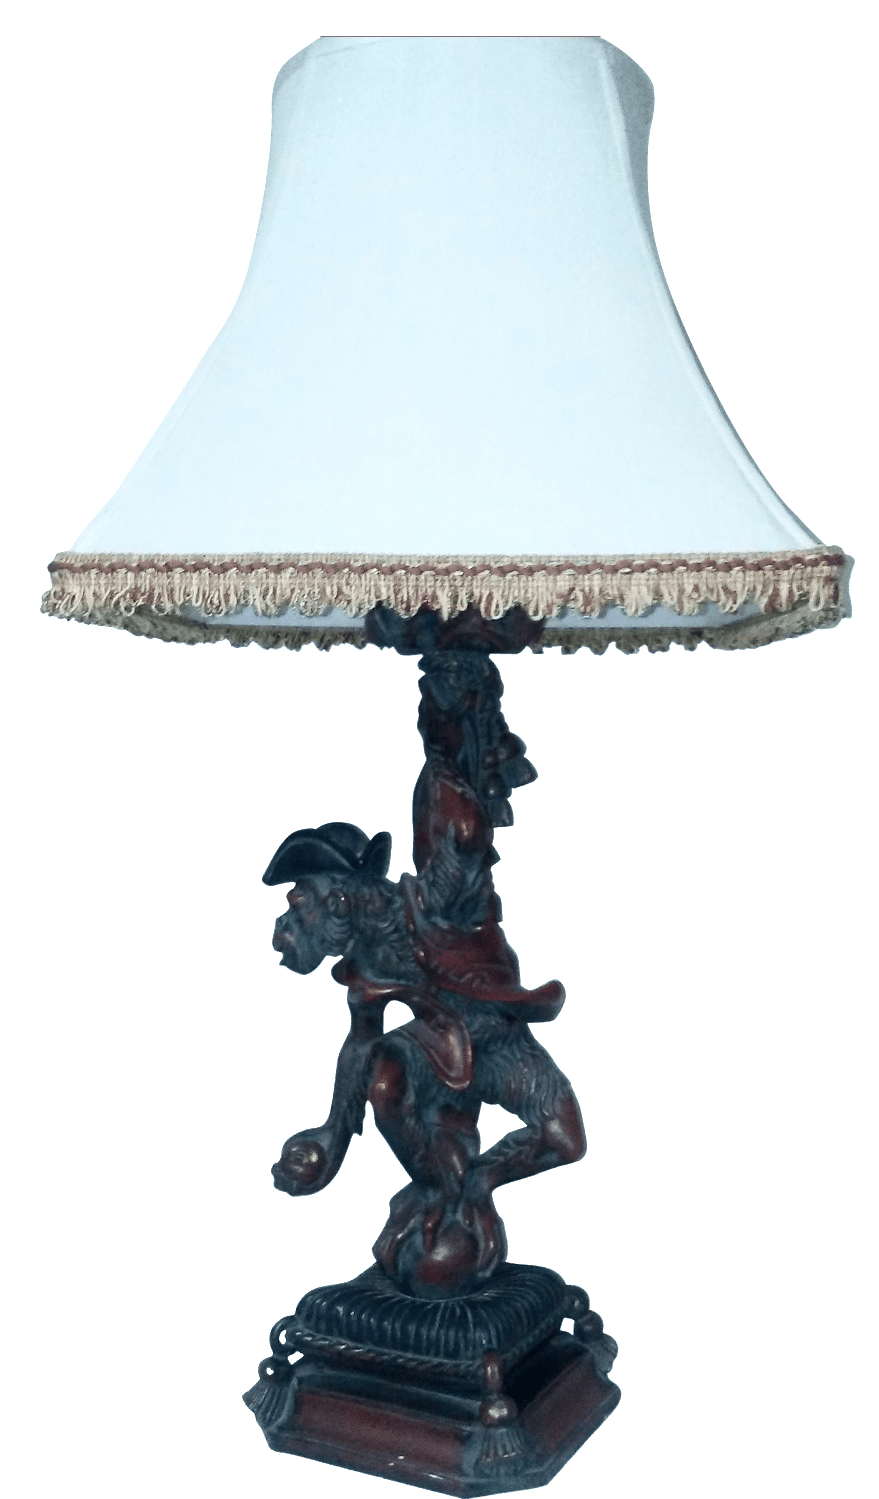 Vintage Monkey Table Lamp  Chairish